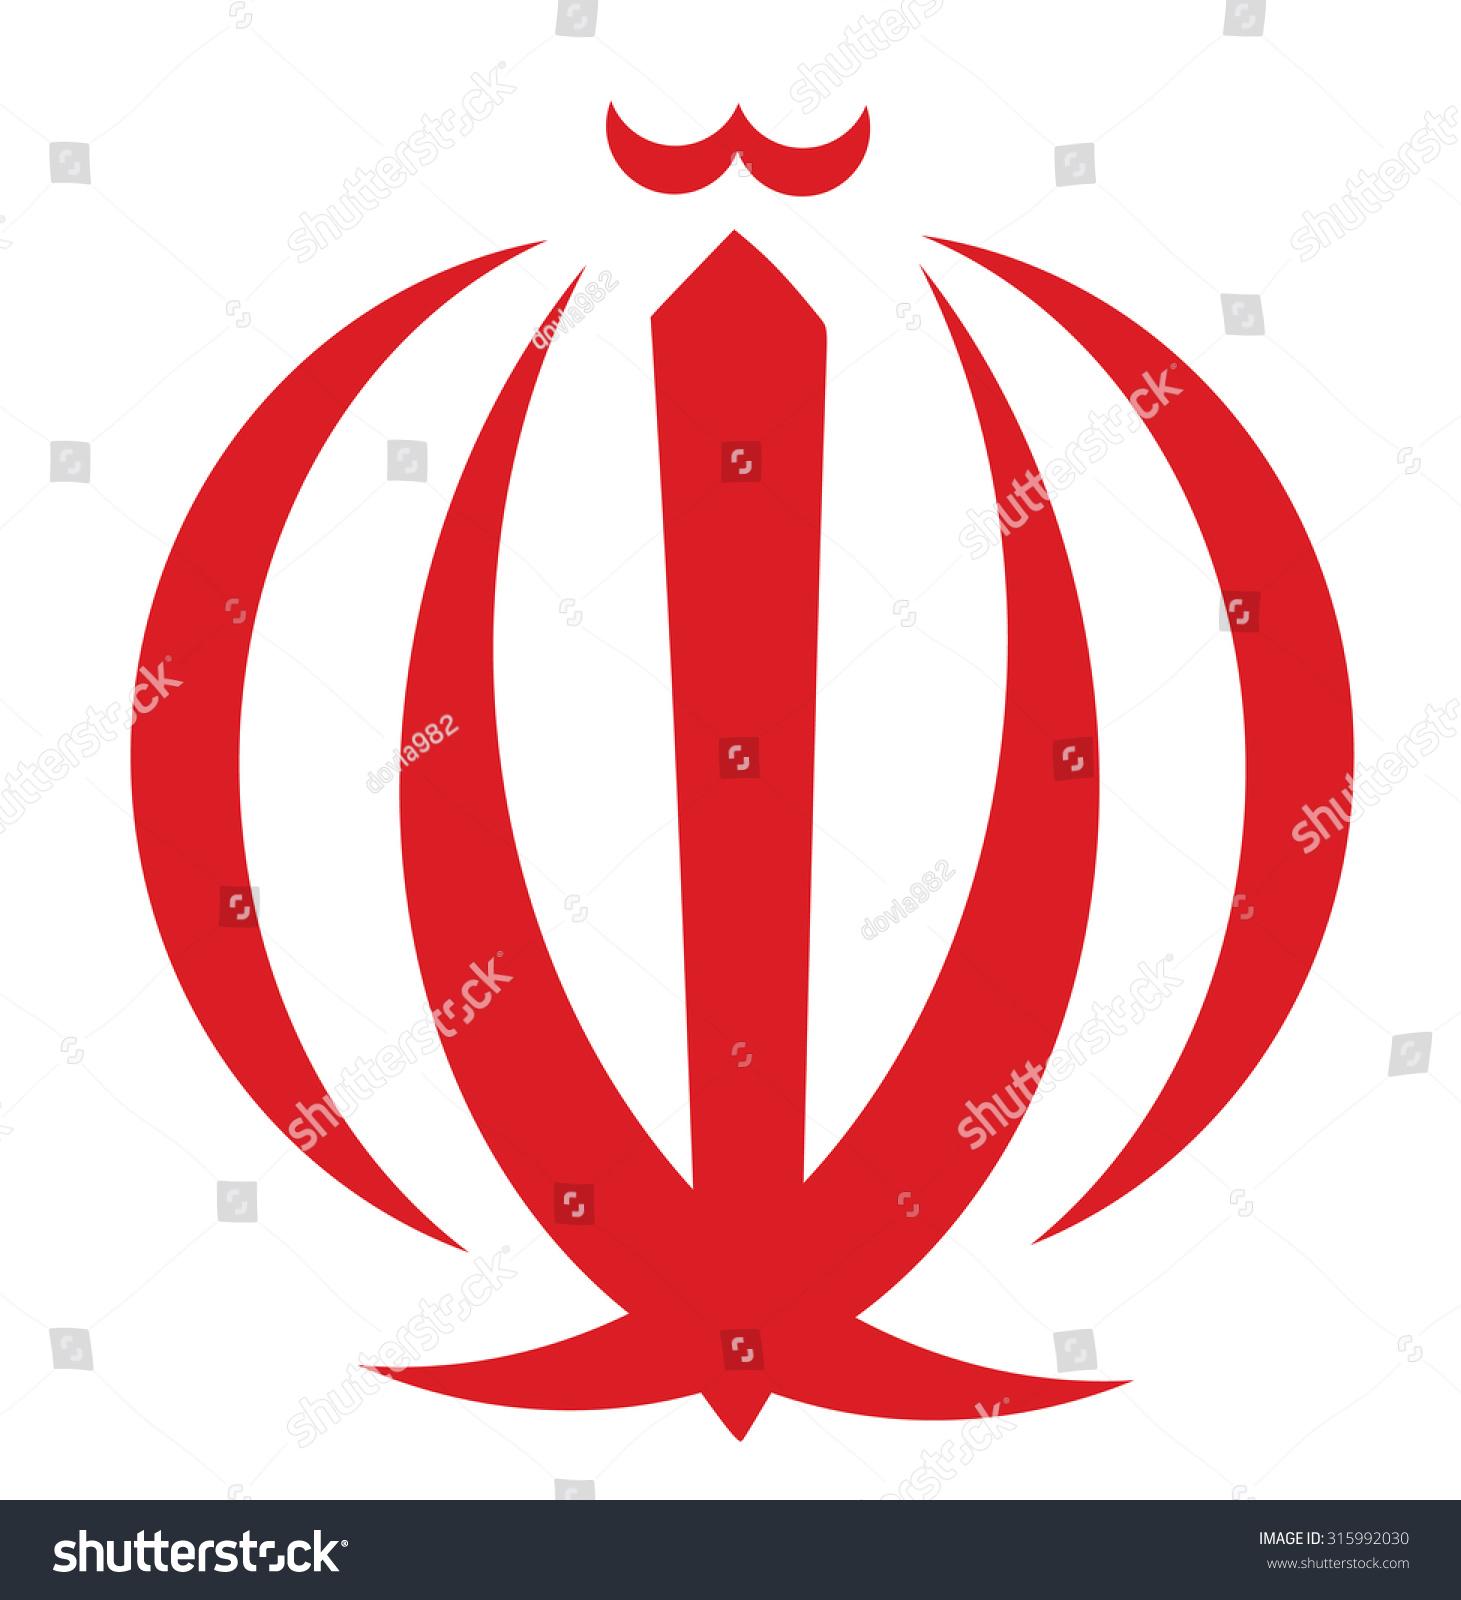 Republic iran coat arms seal national stock vector 315992030 republic of iran coat of arms seal or national emblem vector isolated on white buycottarizona Choice Image